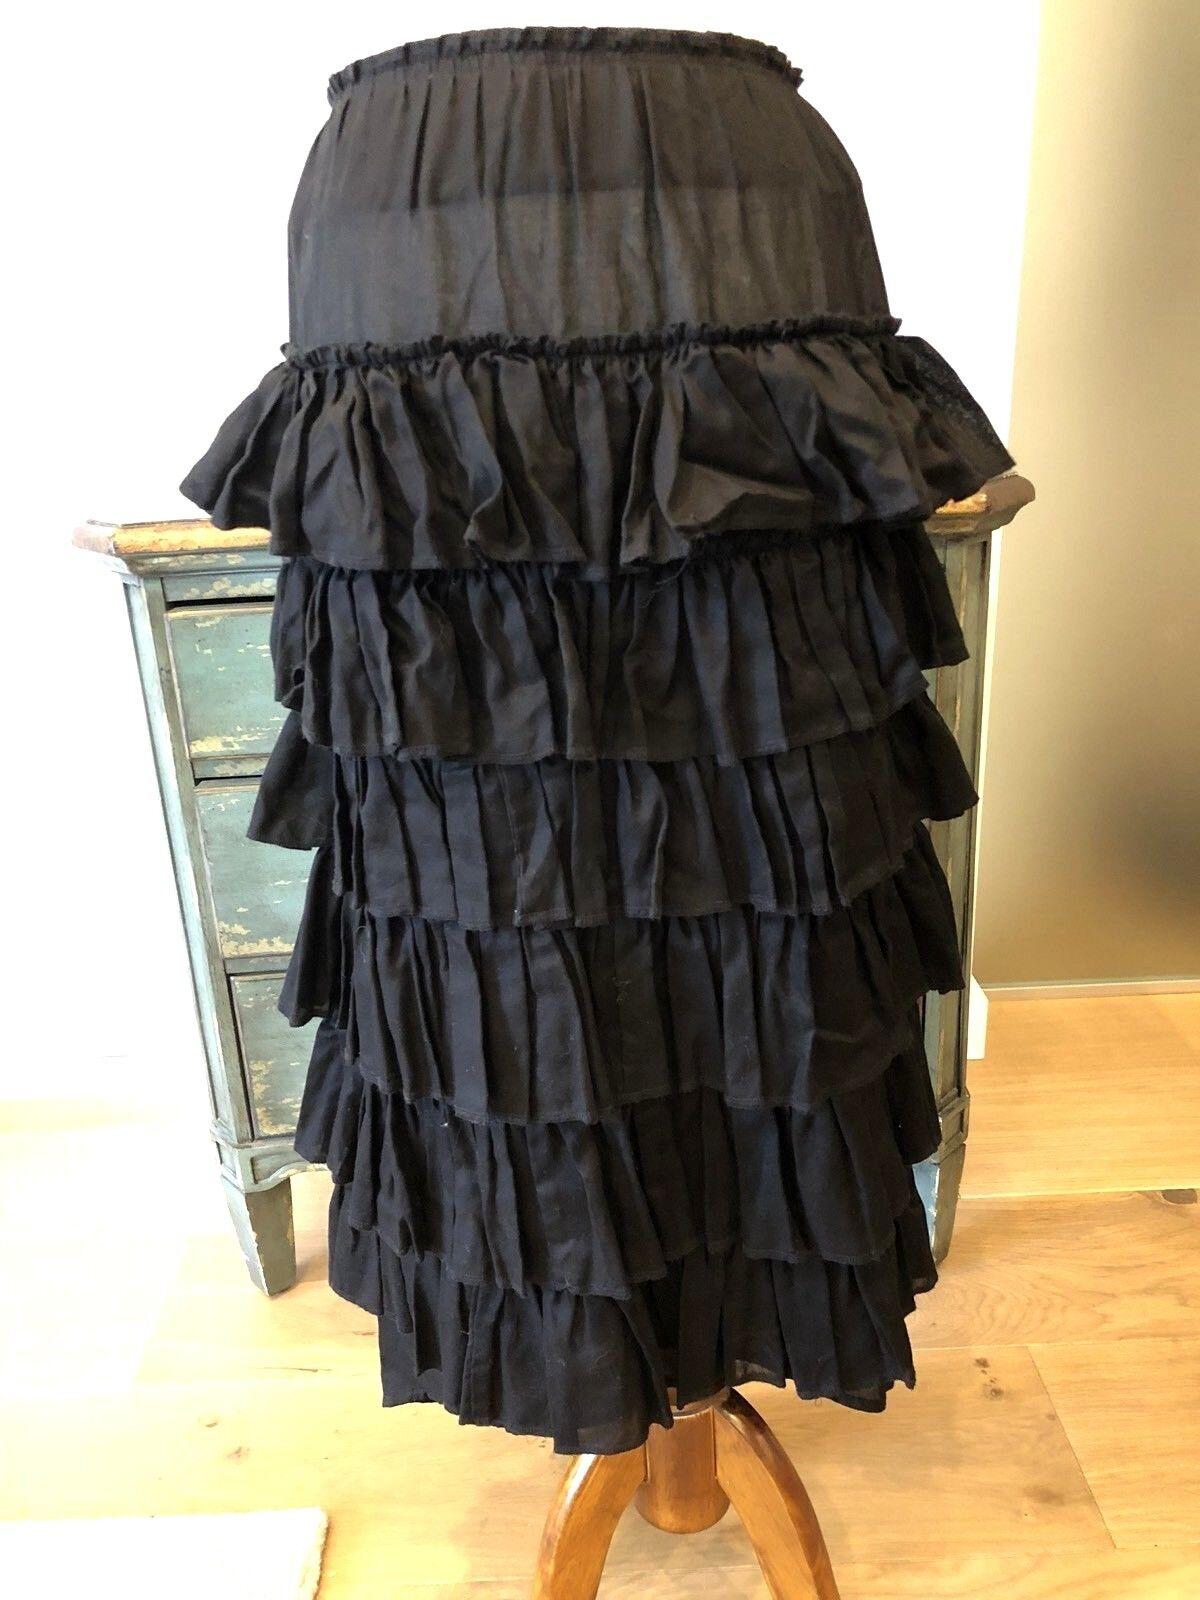 Comme Des Garcons Amunzen Frill Ruffle Skirt with a little tail